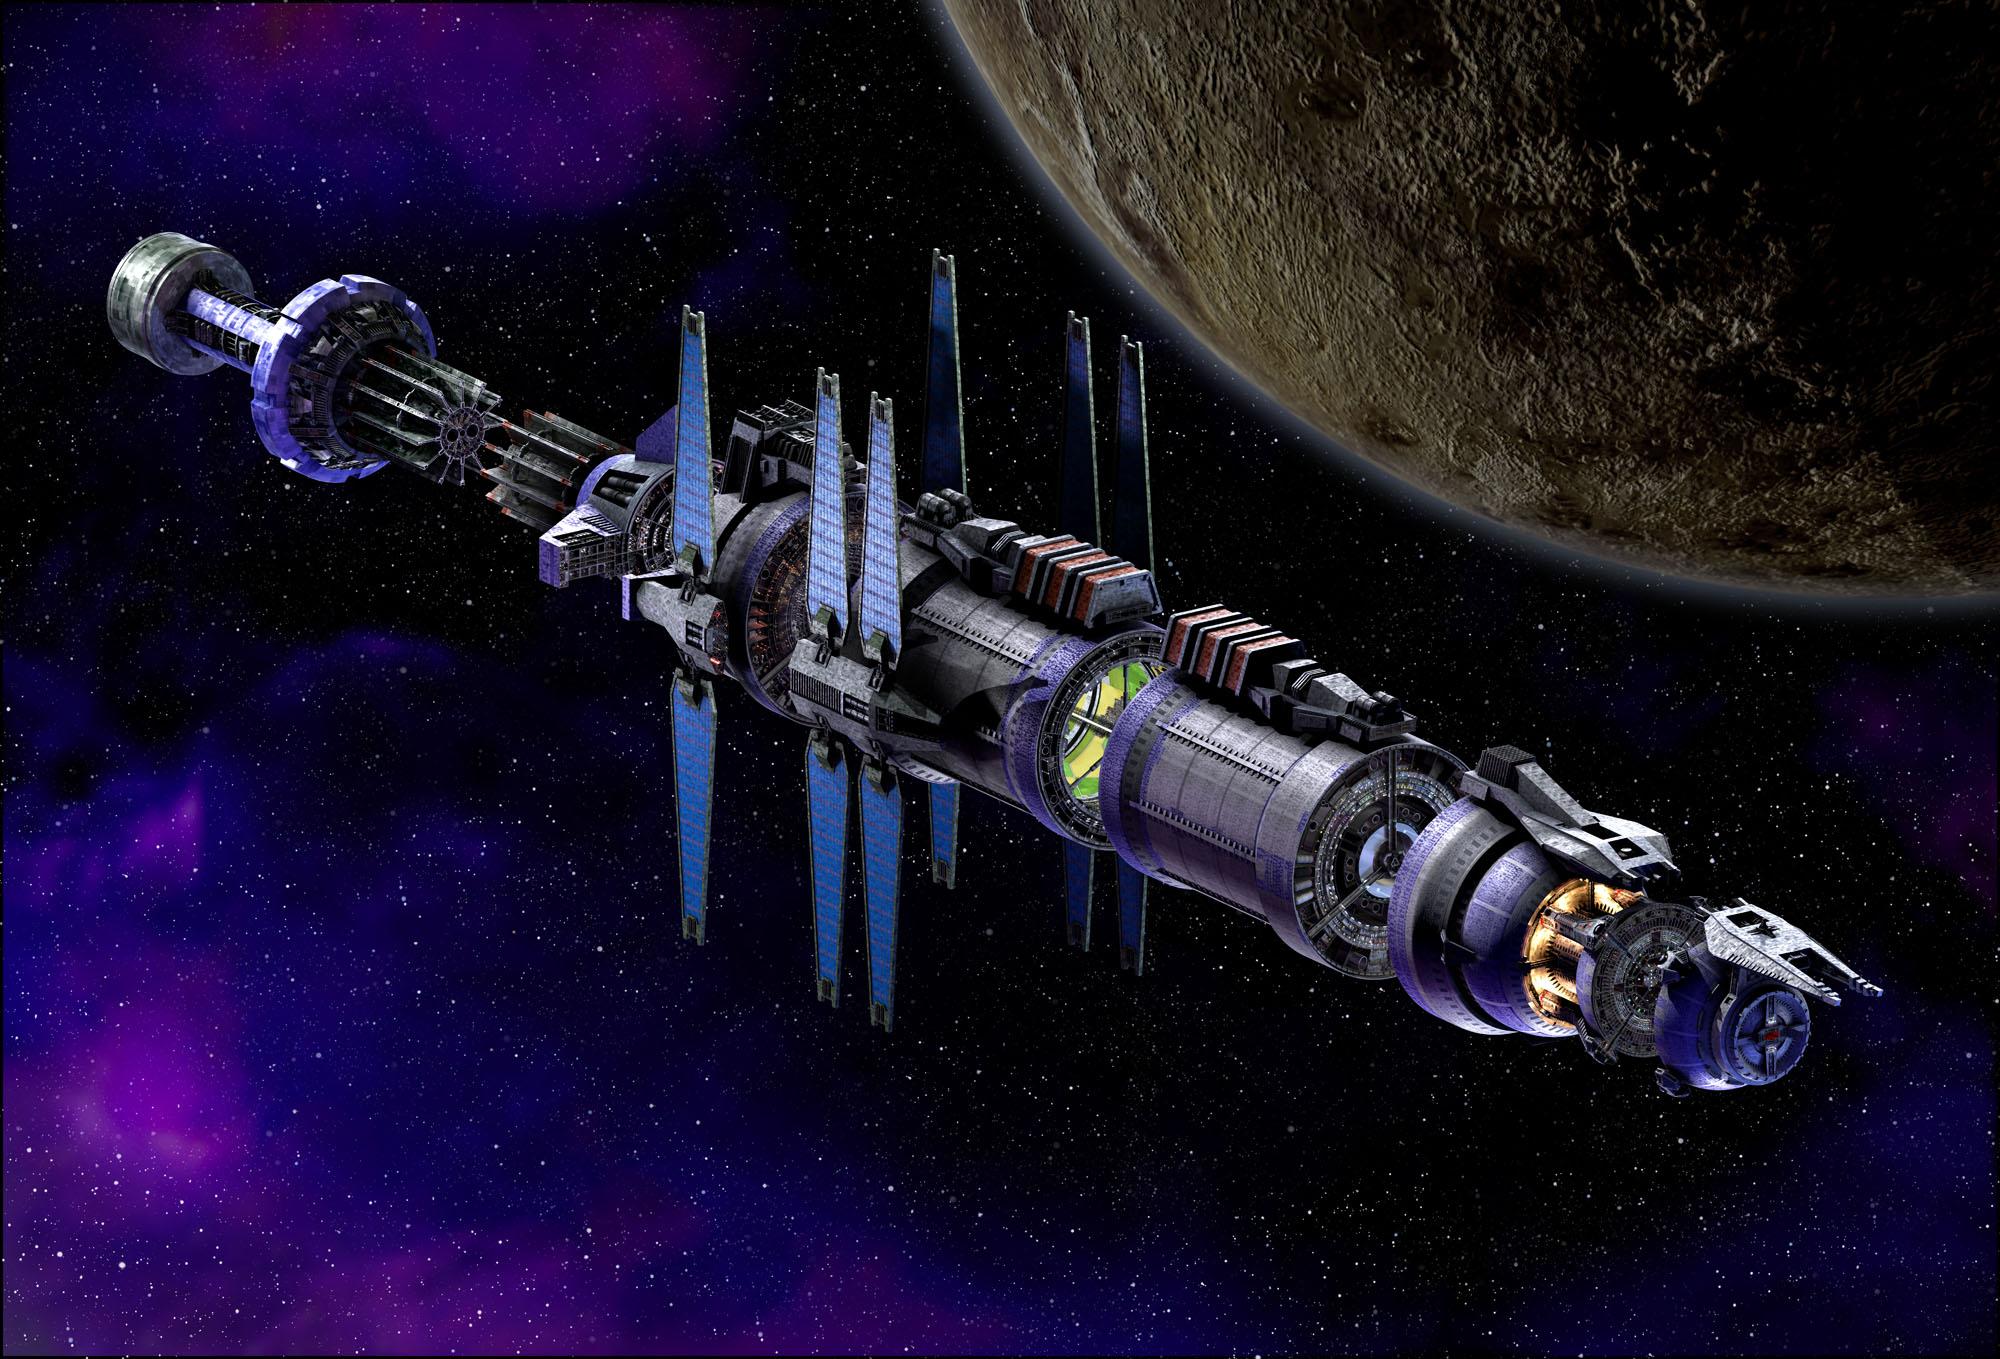 Babylon 5 Backgrounds on Wallpapers Vista